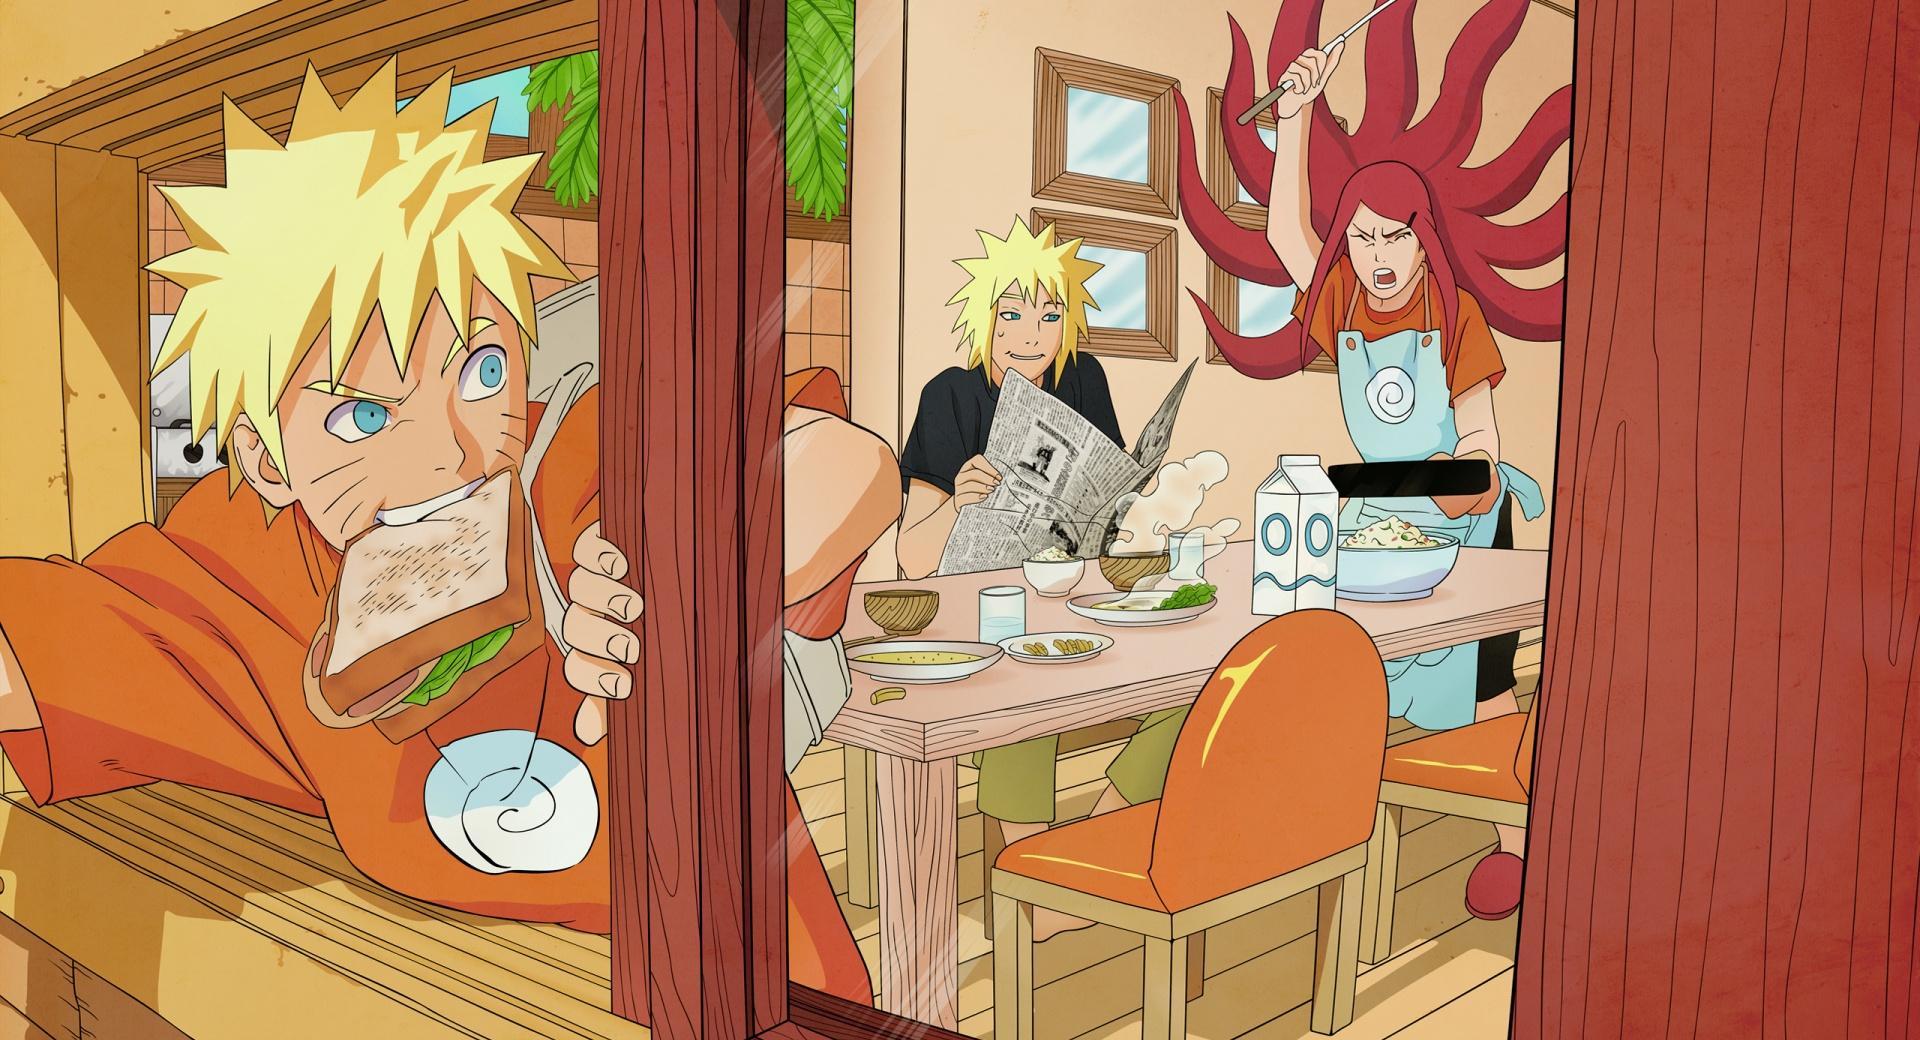 Naruto - The Uzumaki Family wallpapers HD quality